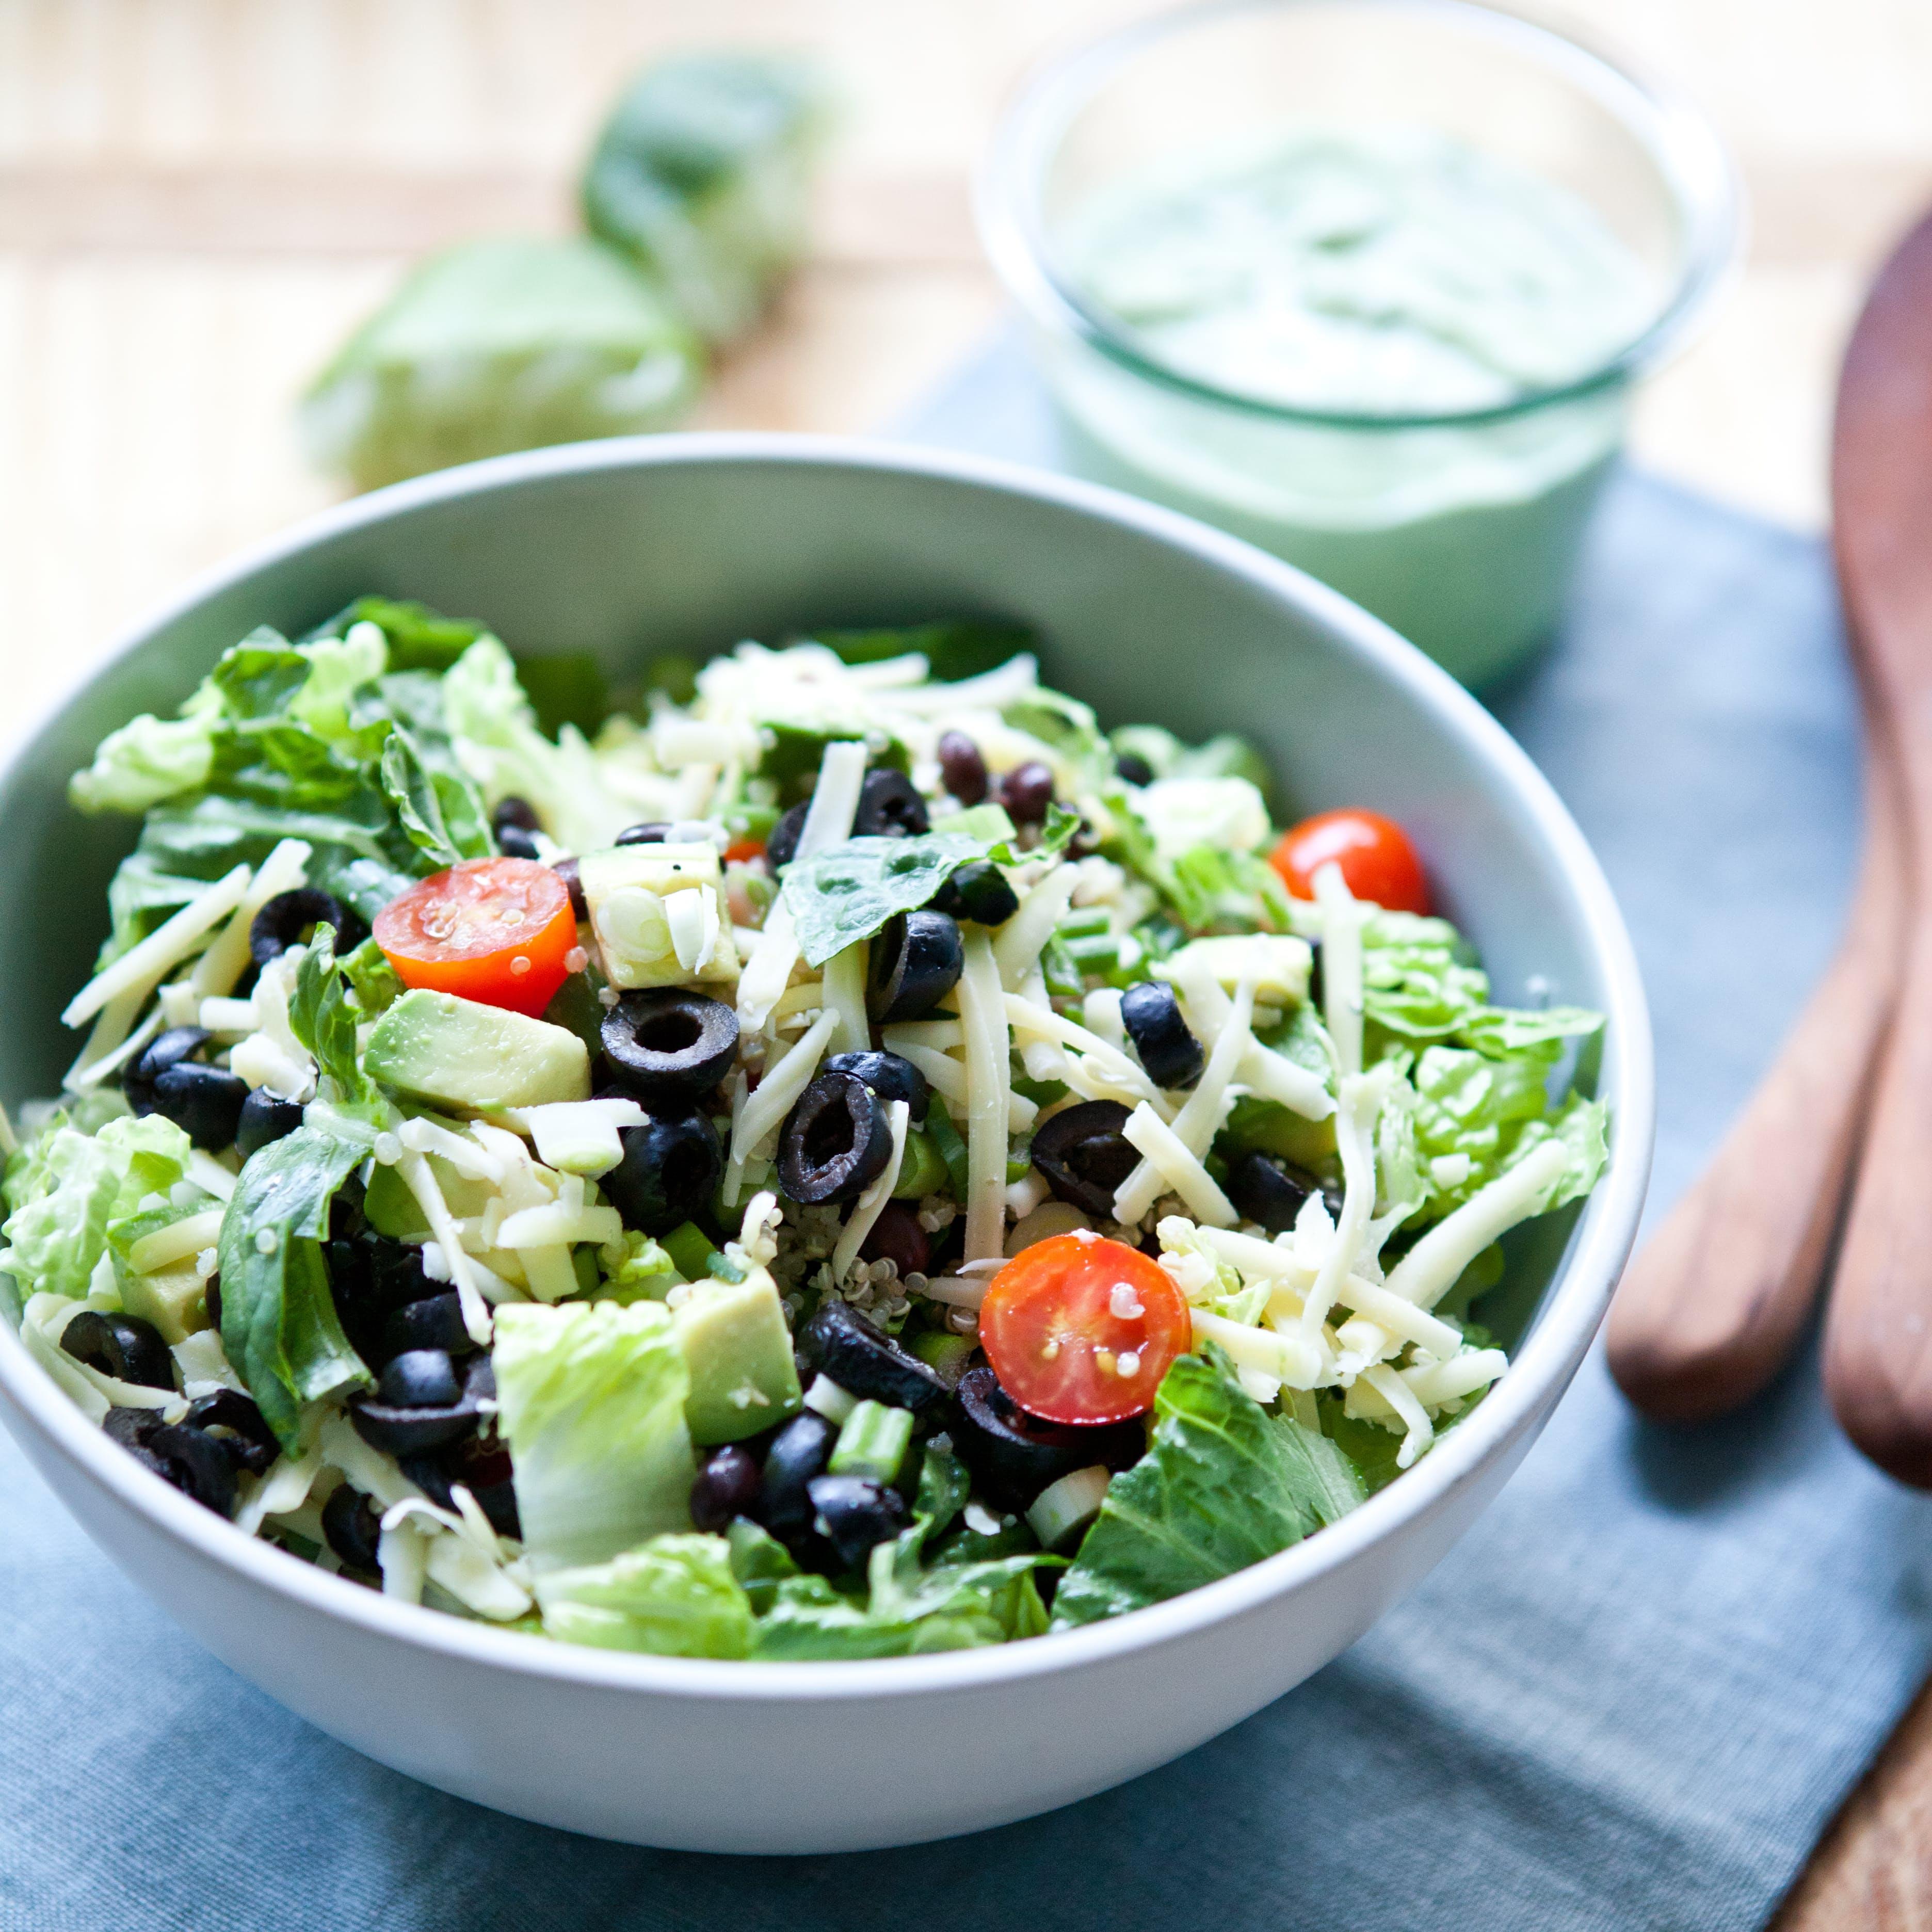 Vegan Stir-Fried Cabbage in Peanut Sauce